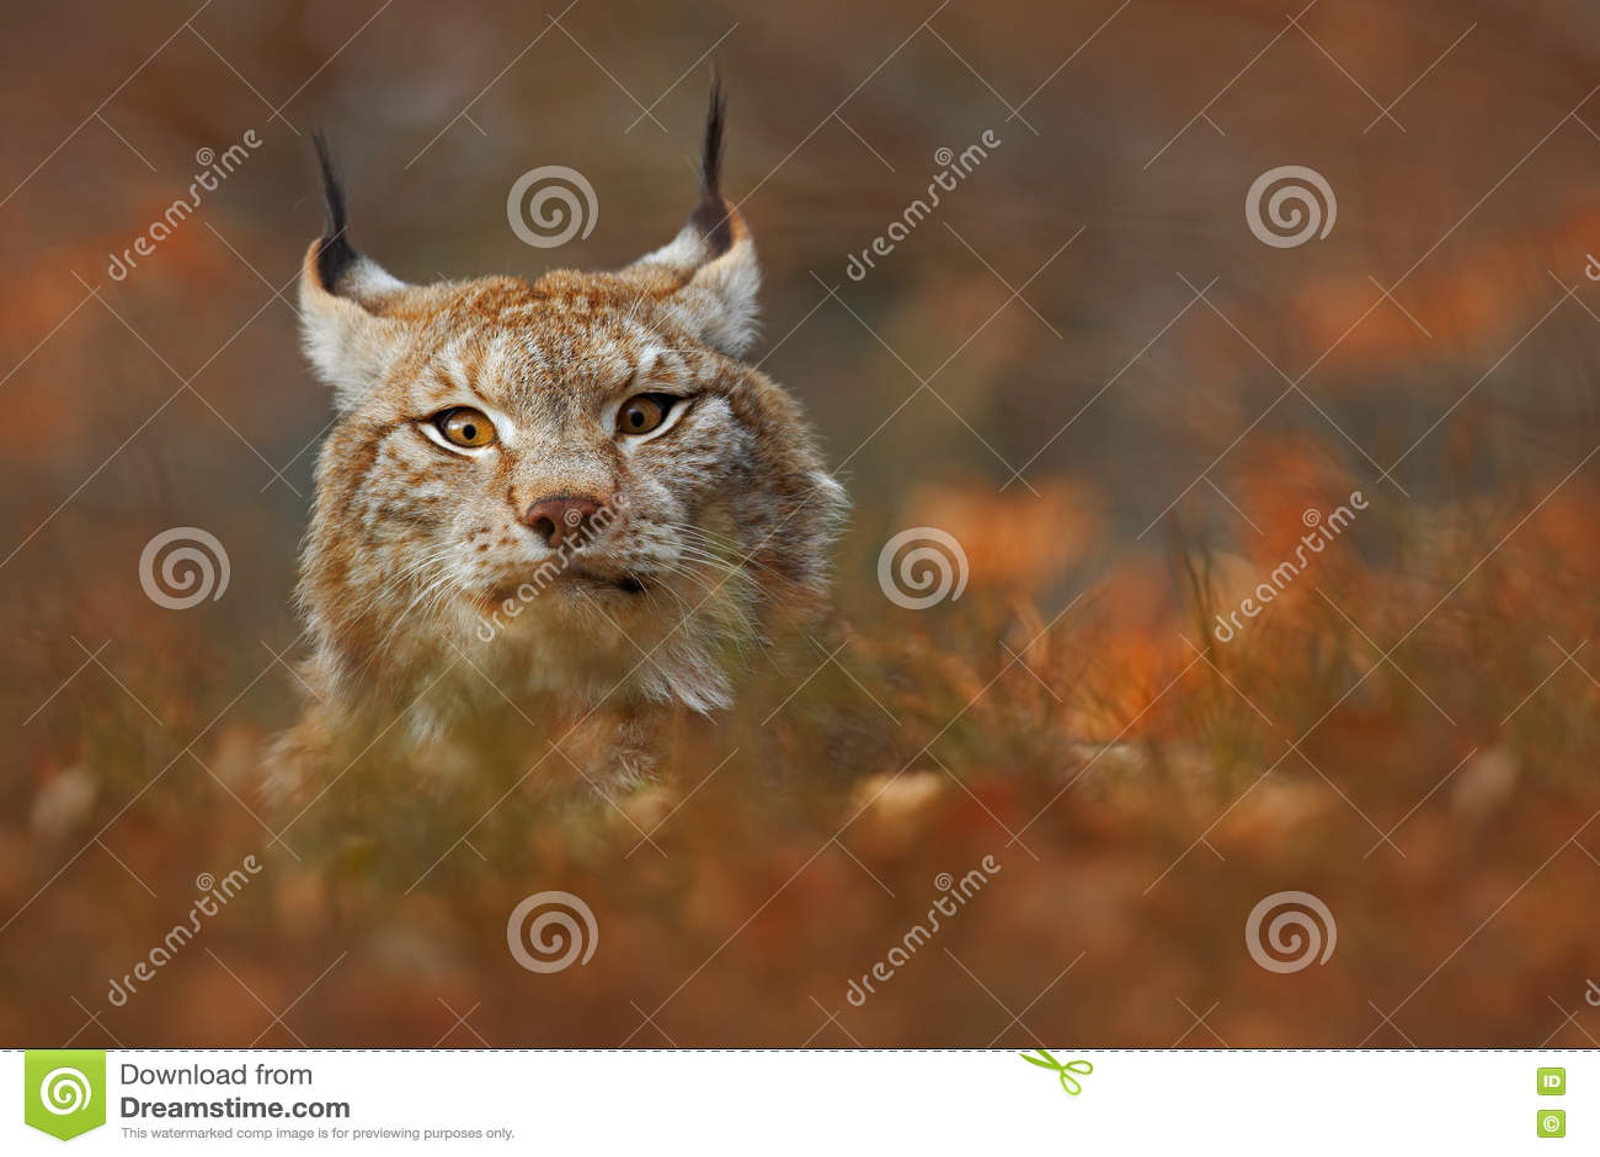 cat lynx autumn foliage - photo #6